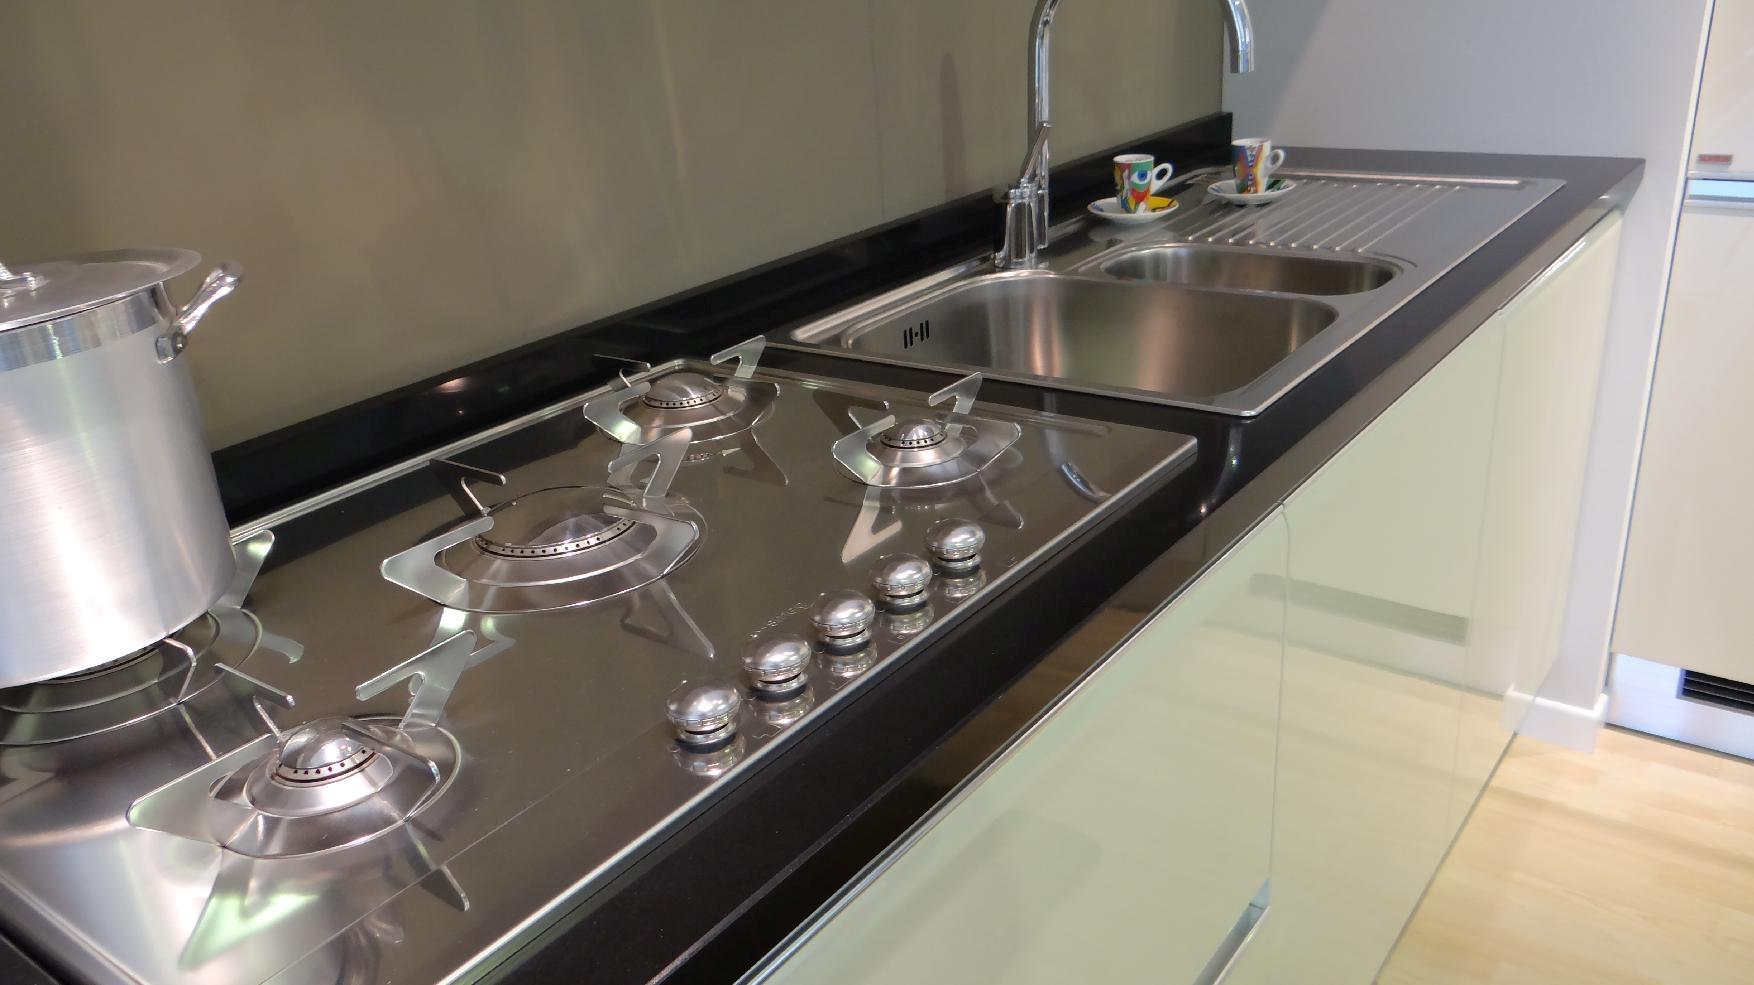 Cucine Scavolini Tess : Offerta scavolini tess beige cucine a prezzi scontati